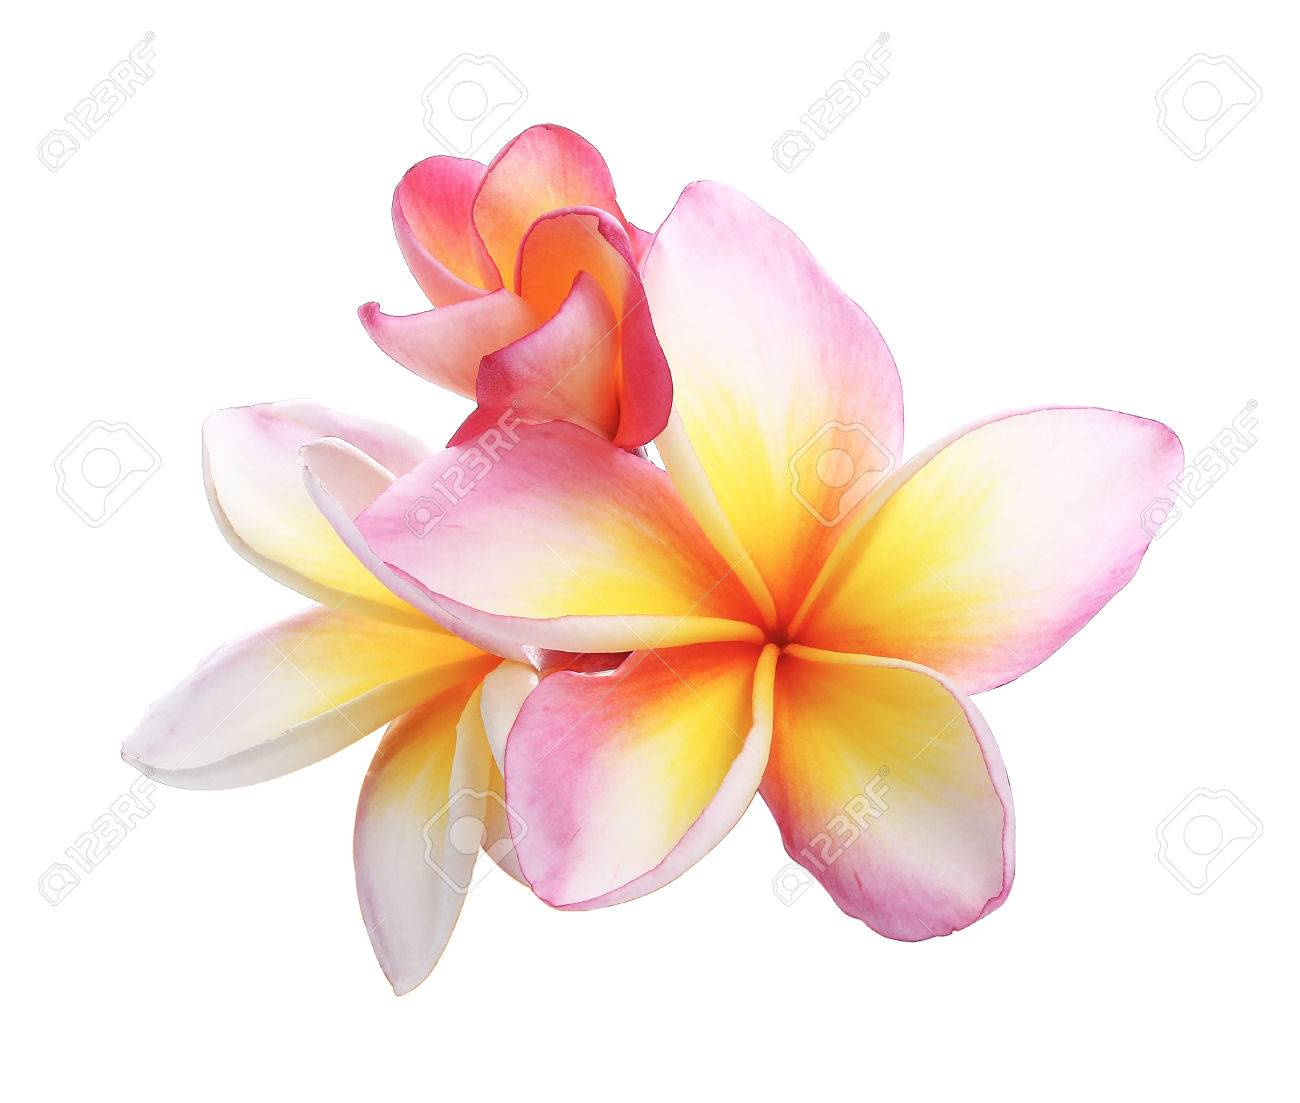 Pink bloom frangipani flower plumeria flower isolated on white pink bloom frangipani flower plumeria flower isolated on white background stock photo 38783816 mightylinksfo Choice Image